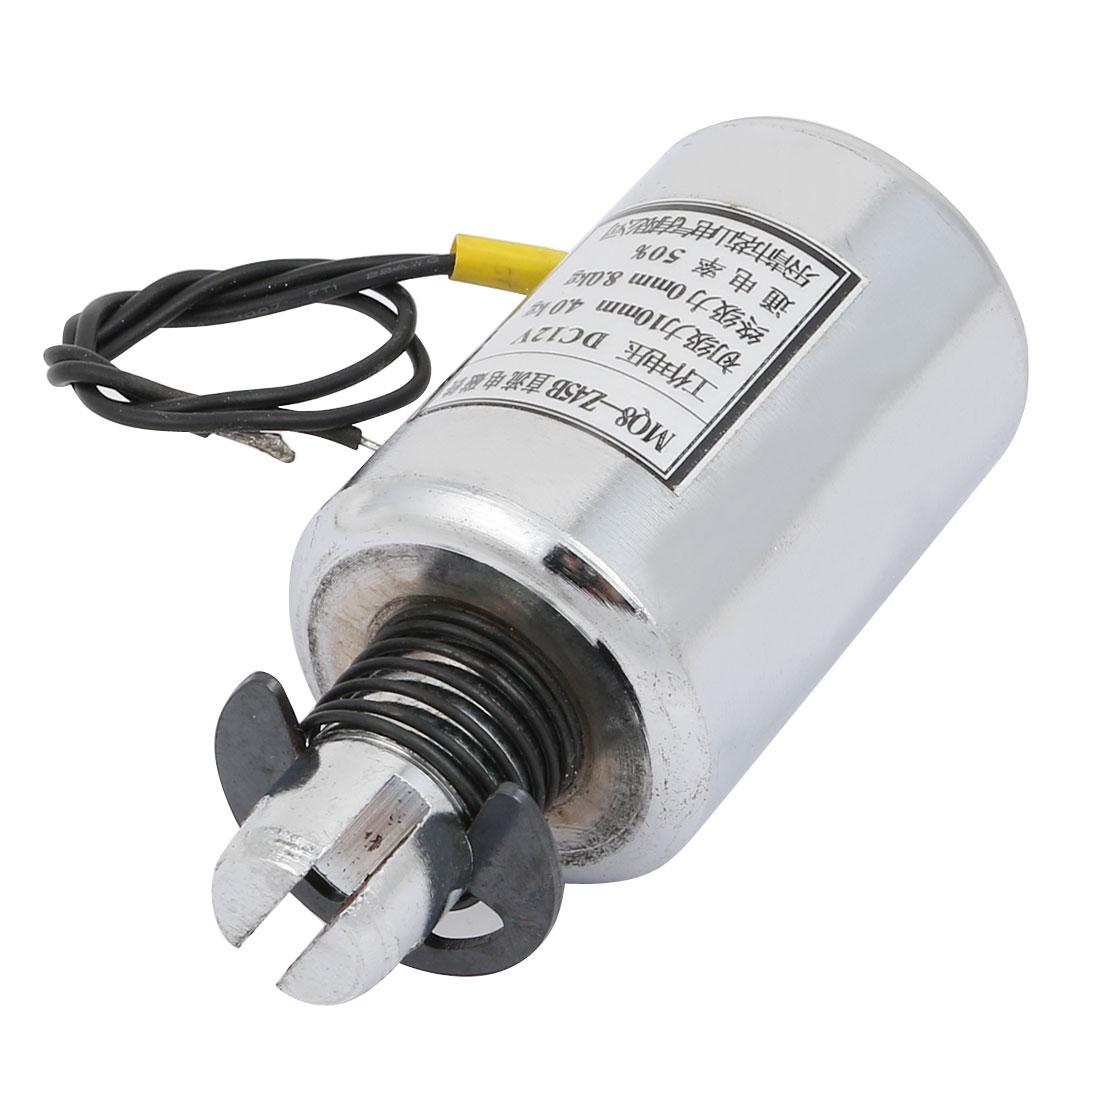 MQ8-Z45B DC 12V 10mm/80N Round Shape Push Pull Type Electromagnet Solenoid